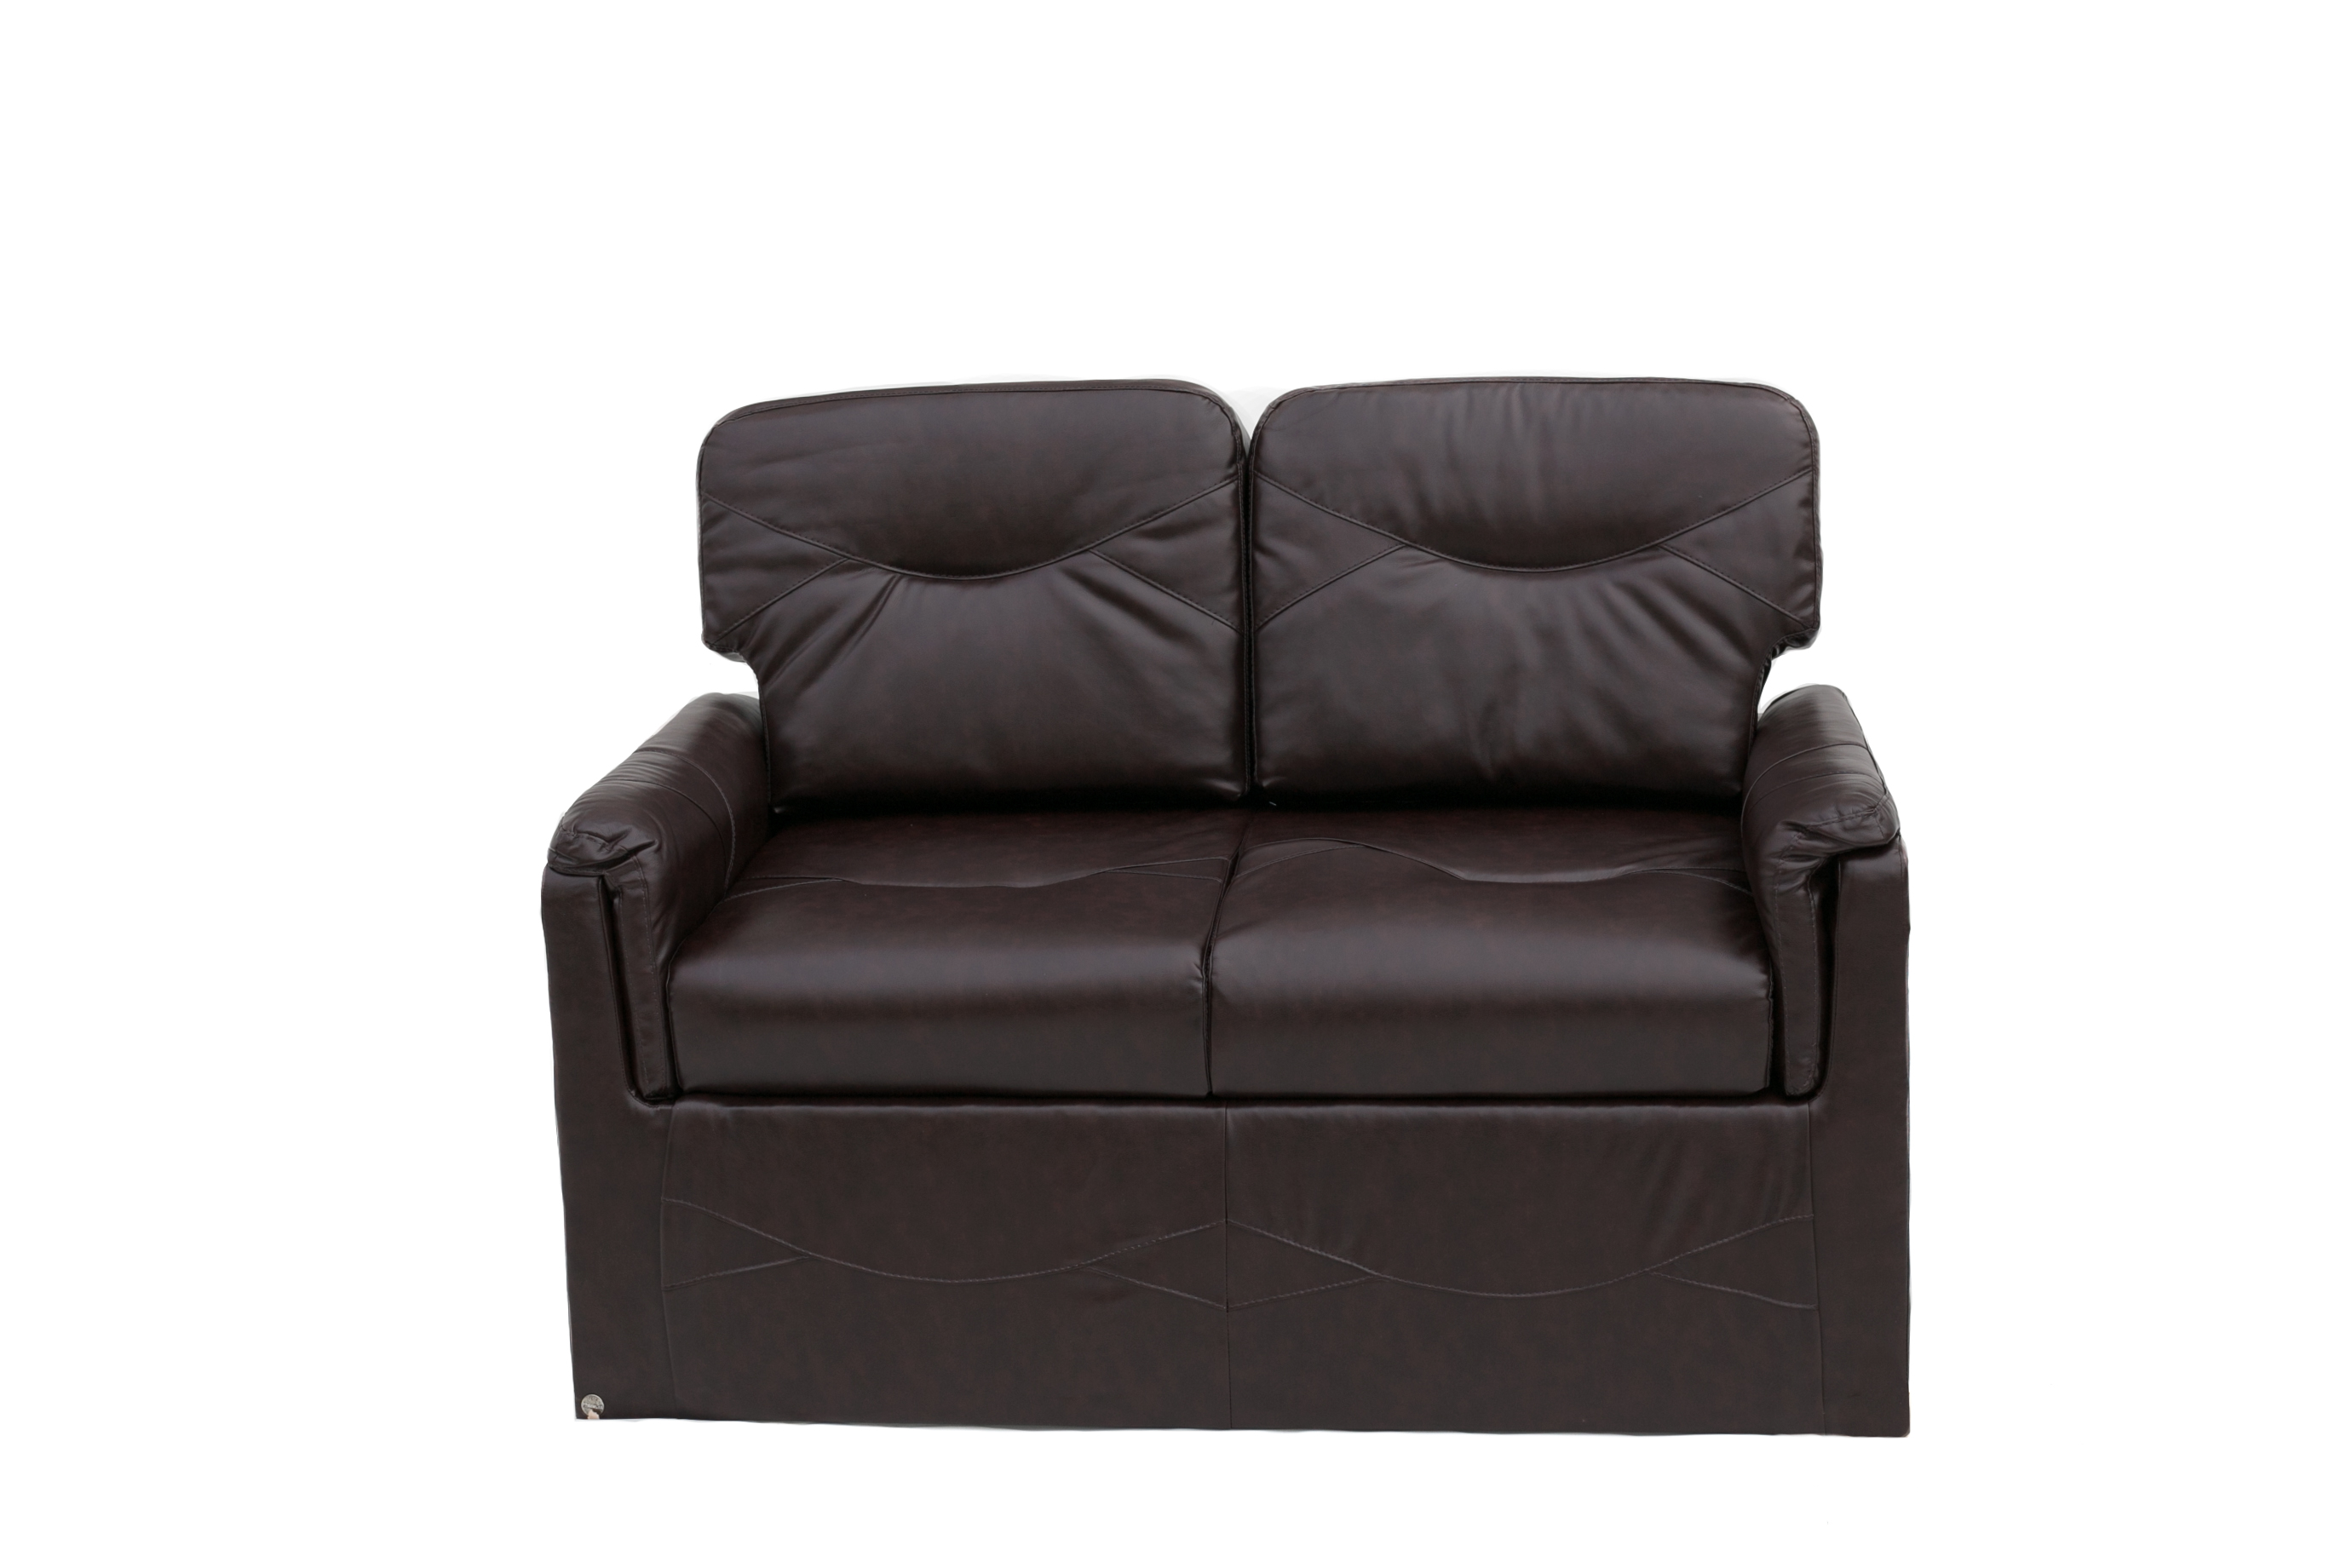 60 Trifold Sleeper Sofa W Cutout Notch Rv Furniture In Jaleco Chocolate Pr468 49 Jc